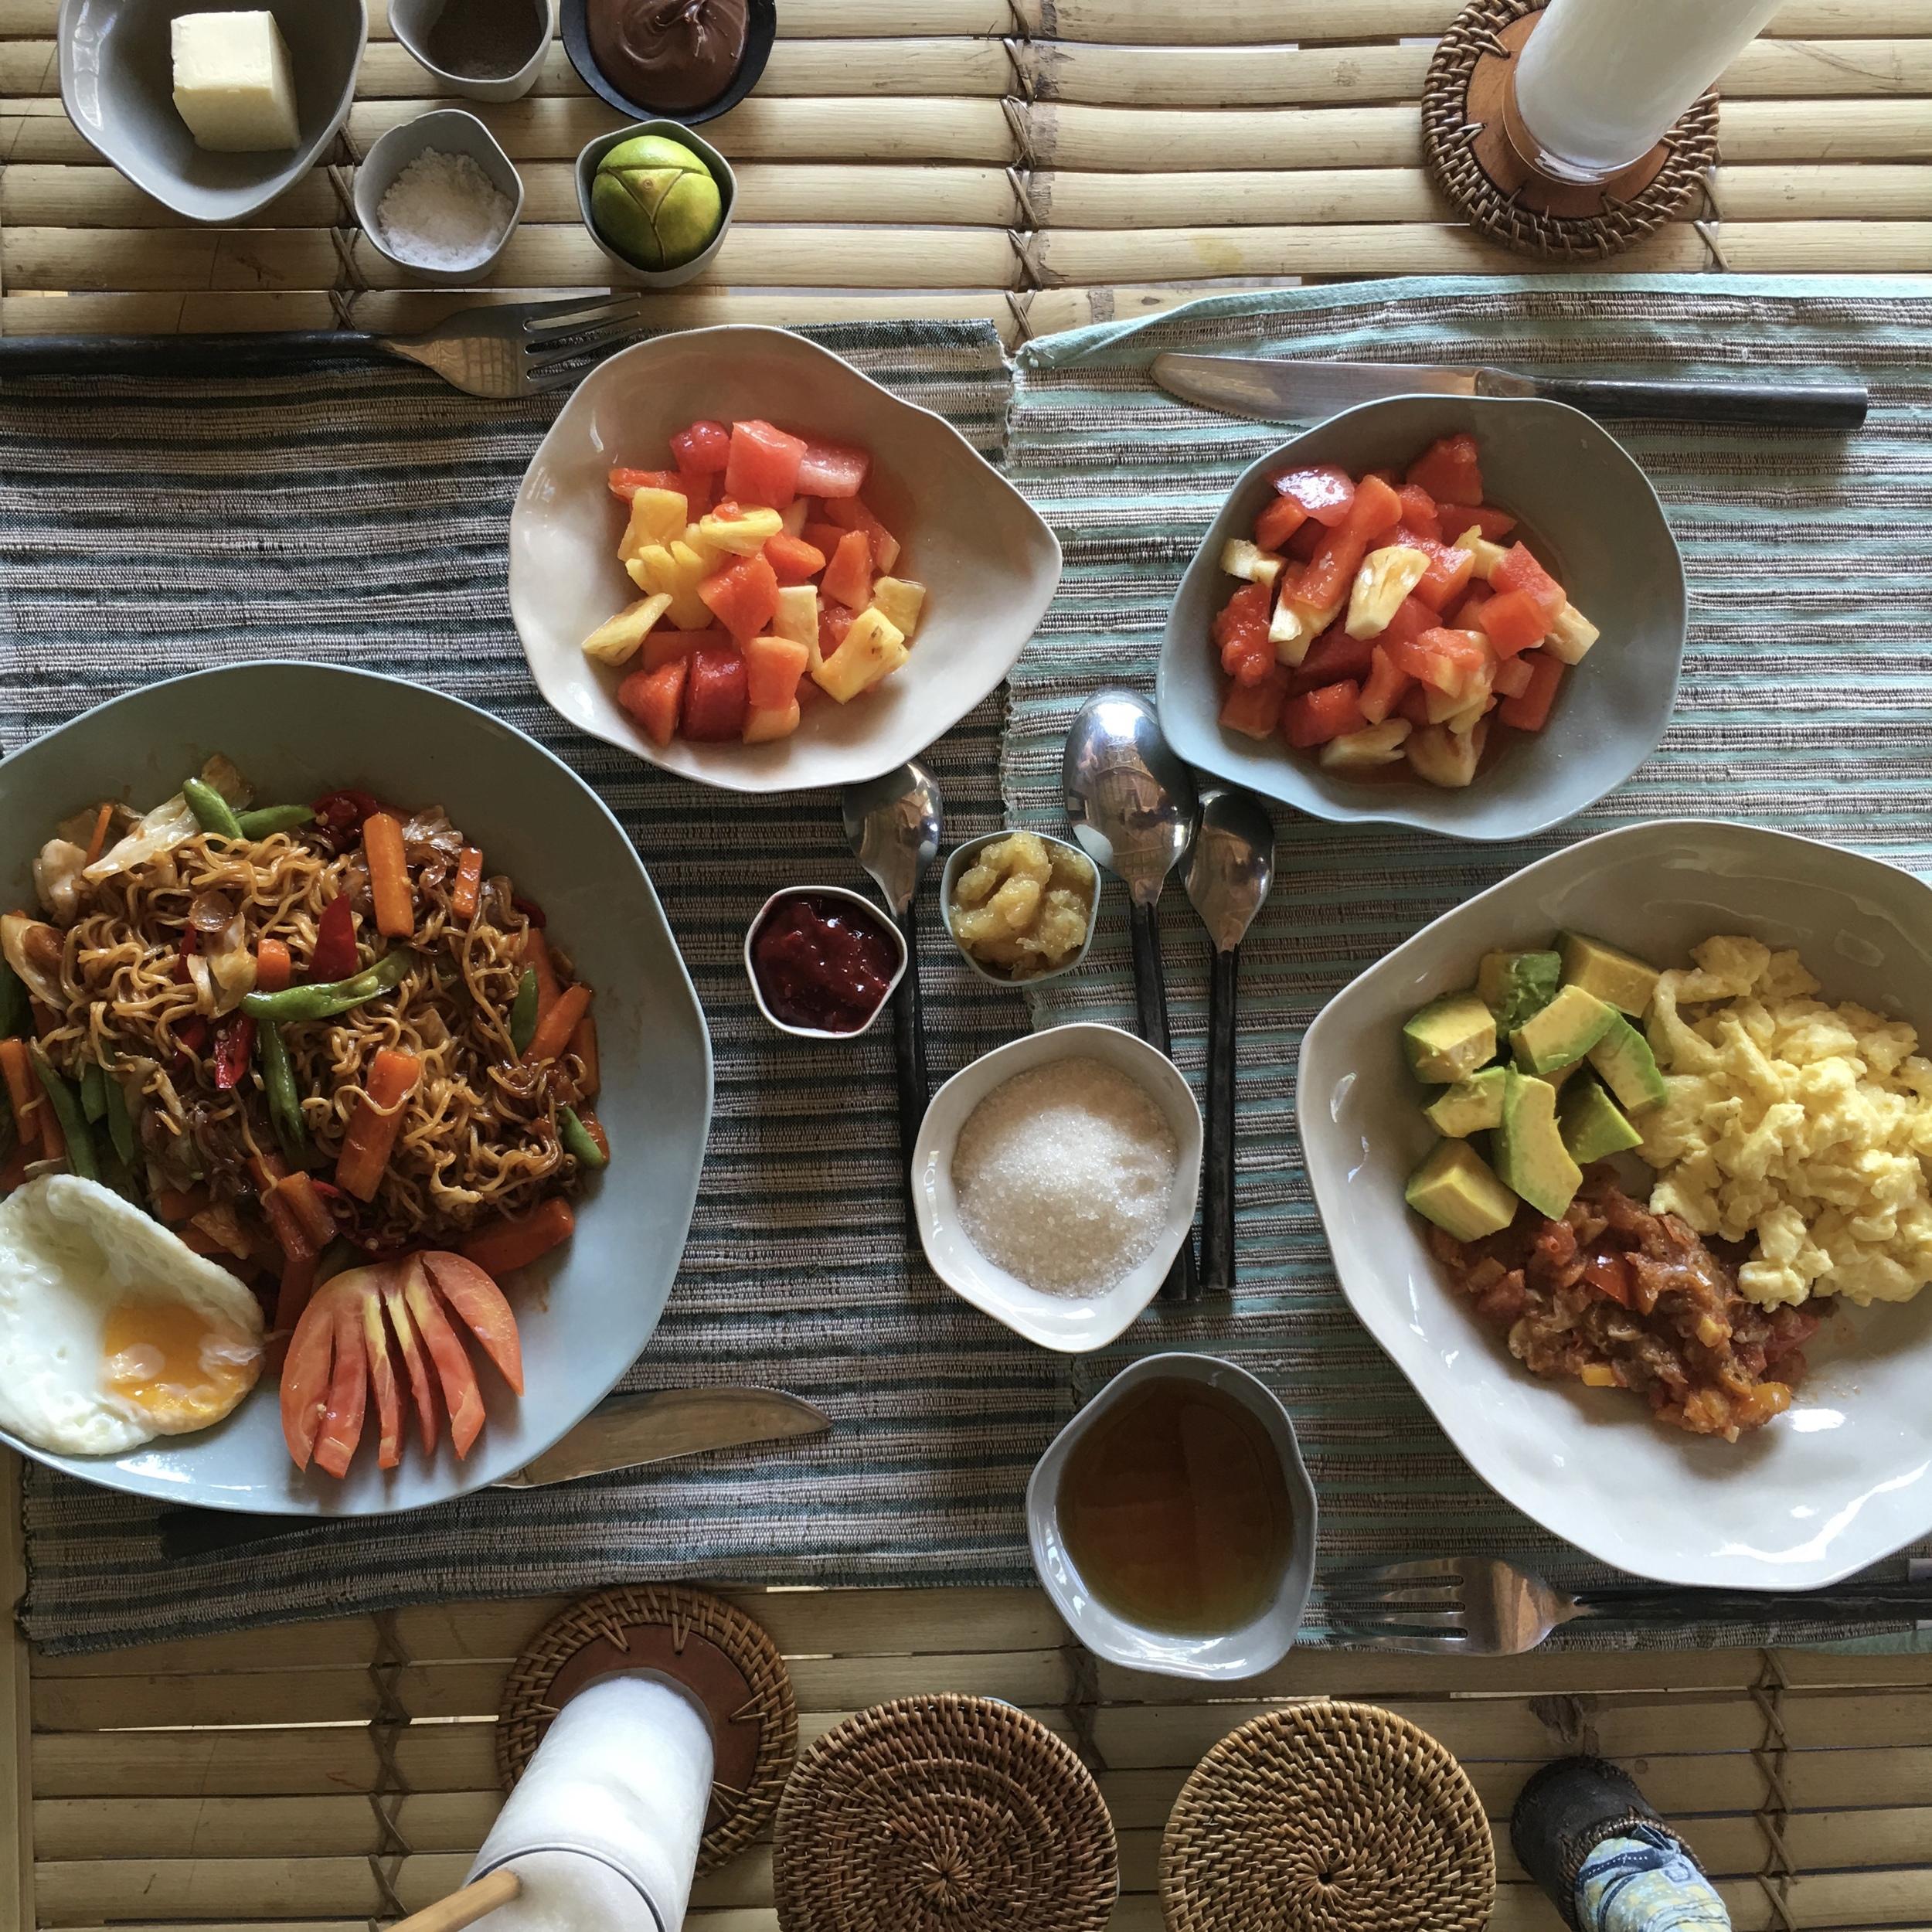 breakfastslowgiliair